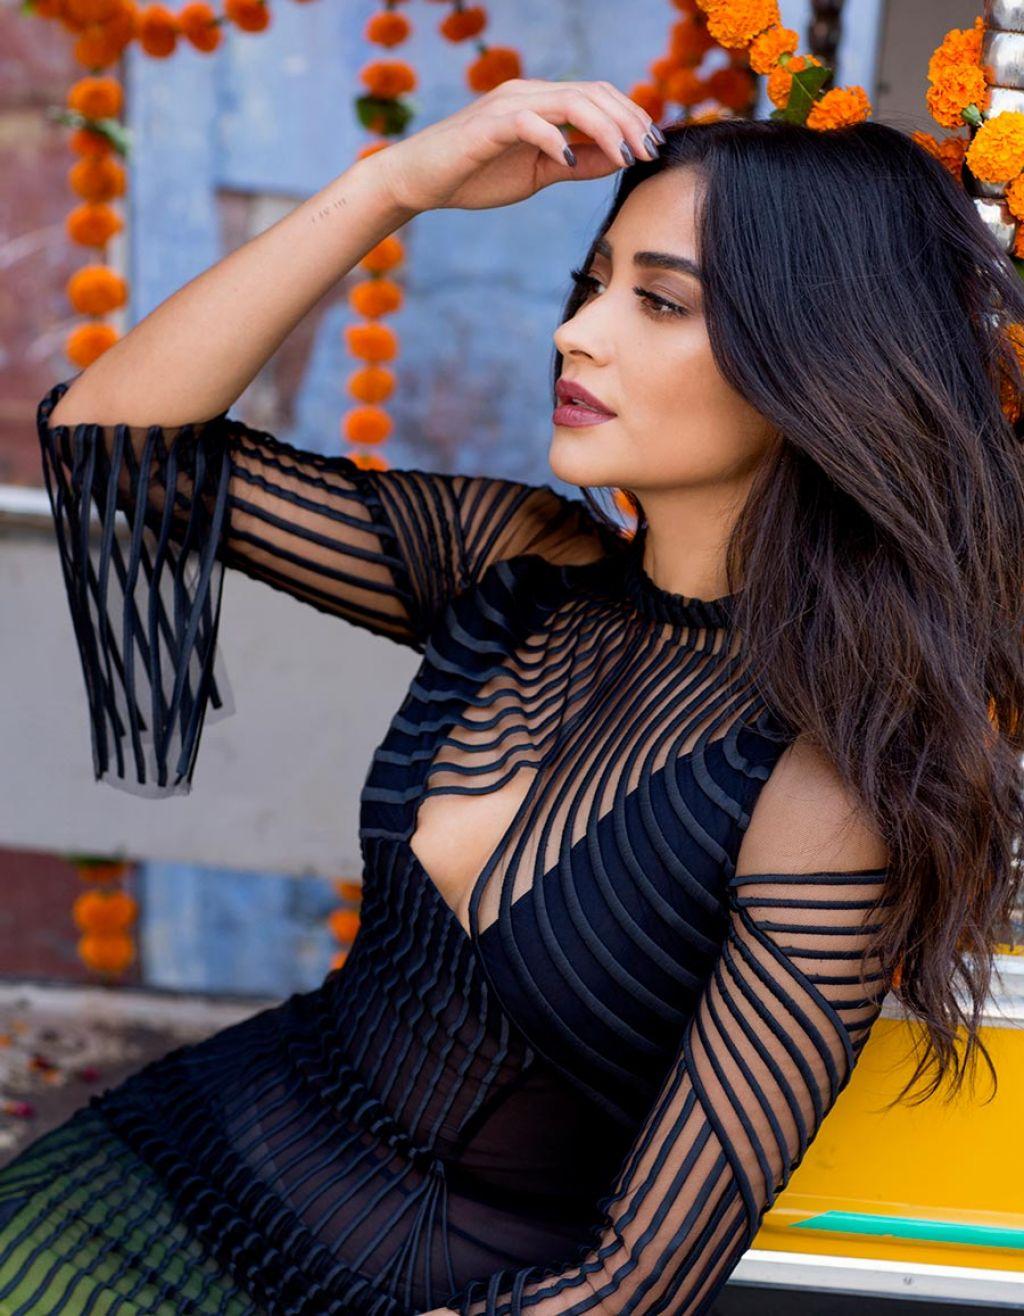 http://celebmafia.com/wp-content/uploads/2018/03/shay-mitchell-photoshoot-for-modeliste-magazine-march-2018-21.jpg